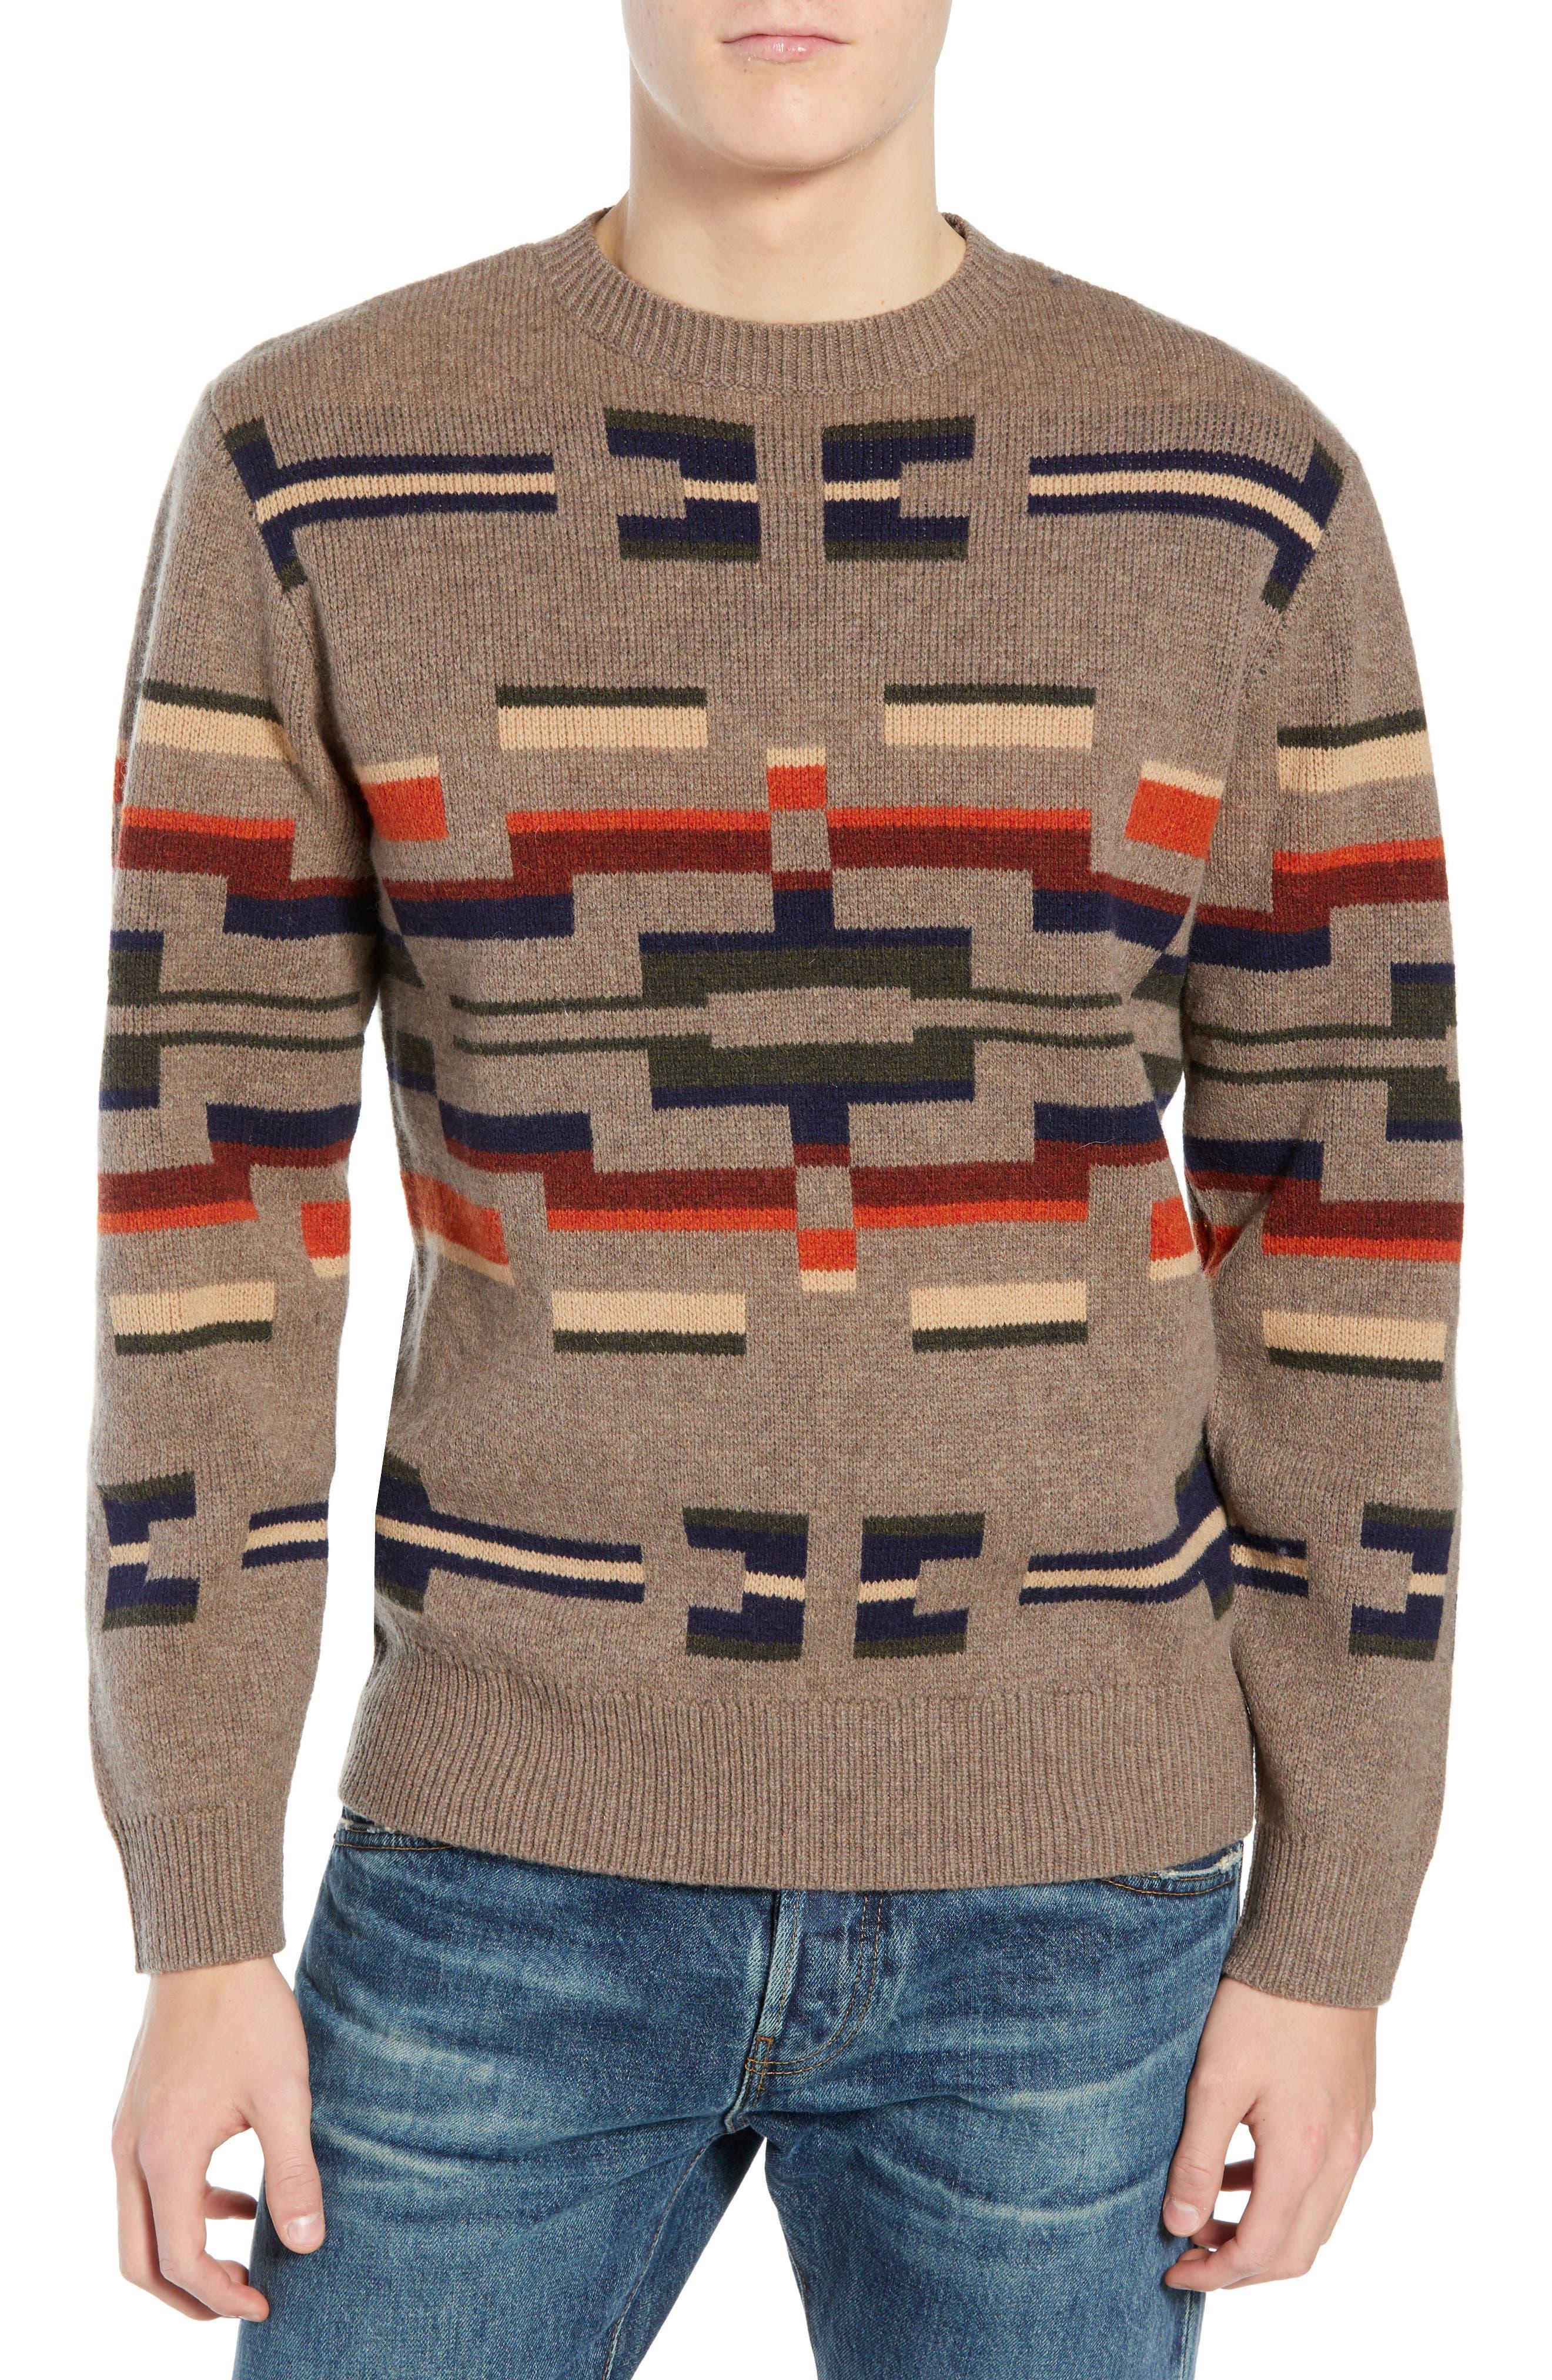 PENDLETON Outdoor Wool Sweater in Multi Novelty Motif